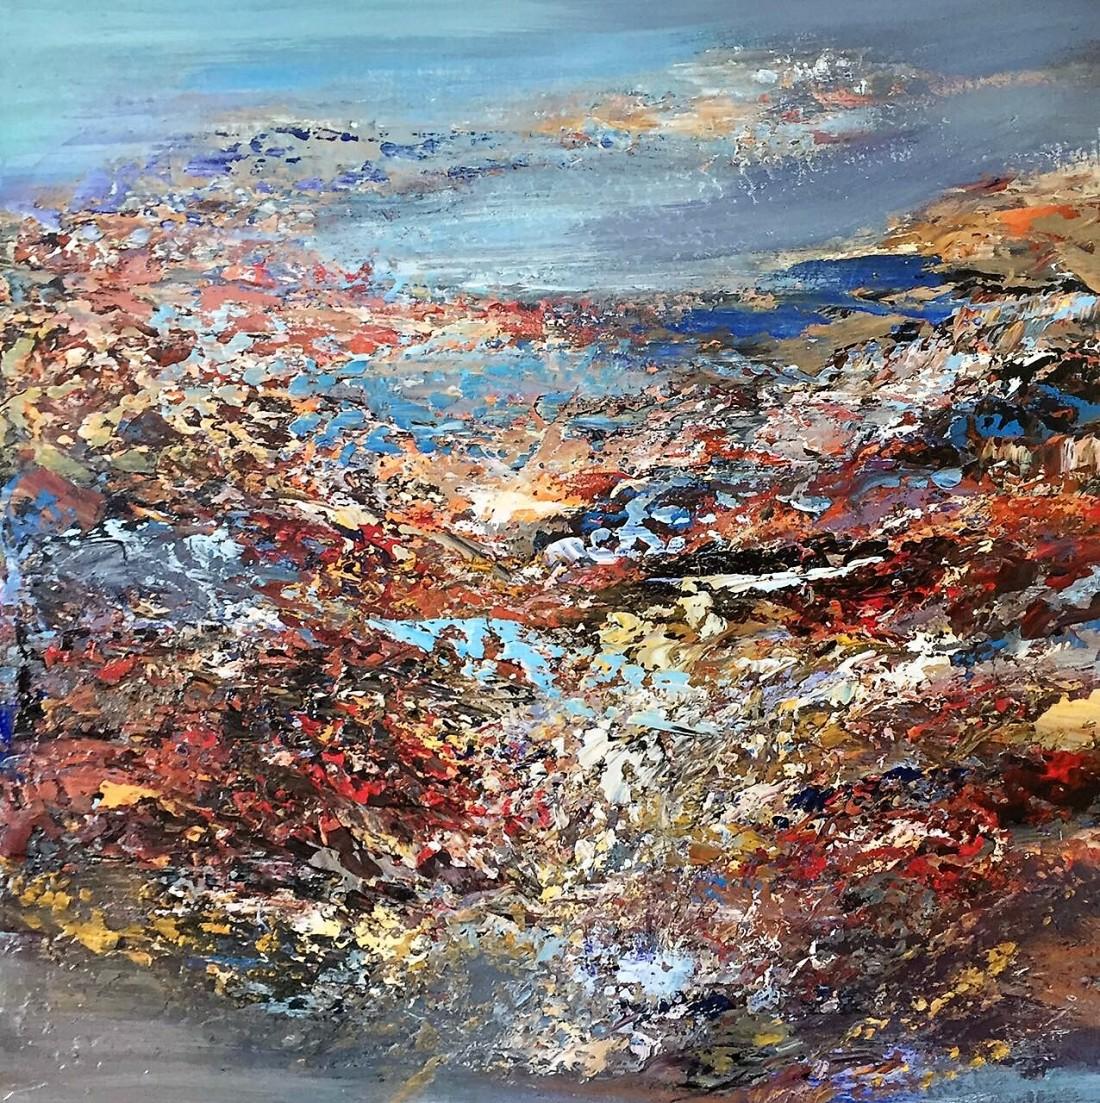 Playa Conchal (1).JPG